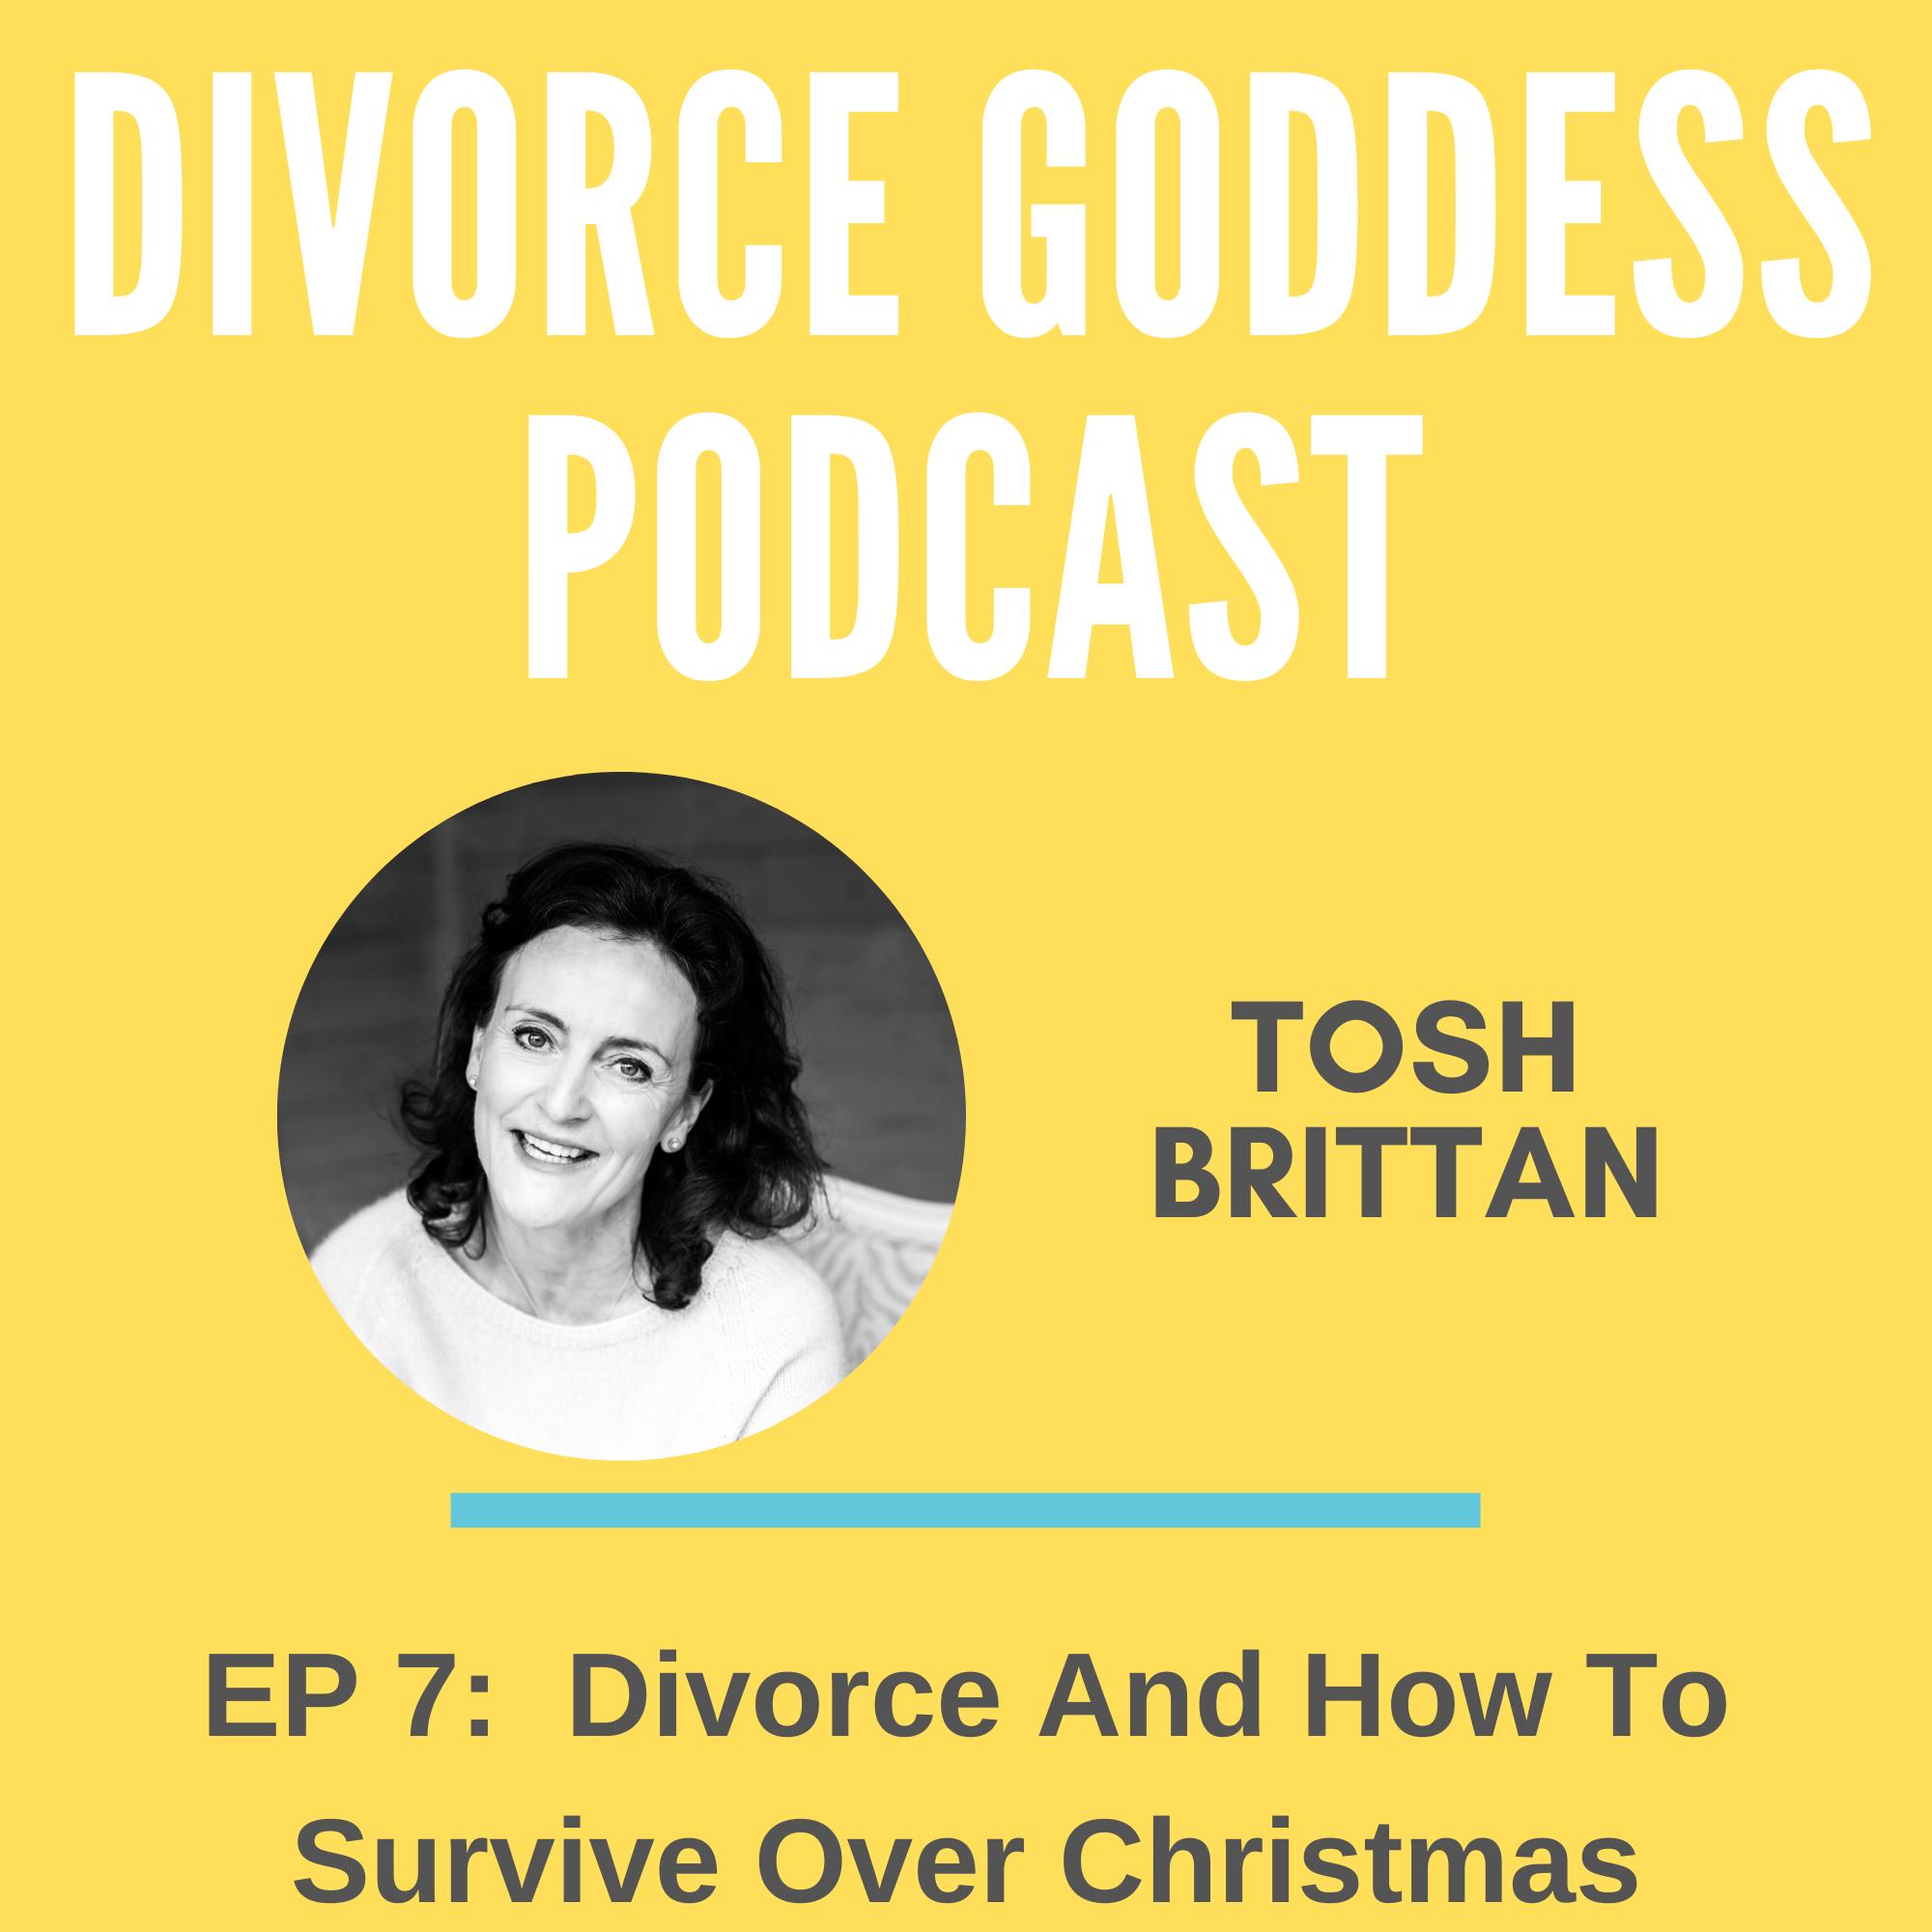 Divorce Goddess Podcast - Divorce & How to Survive Over Christmas